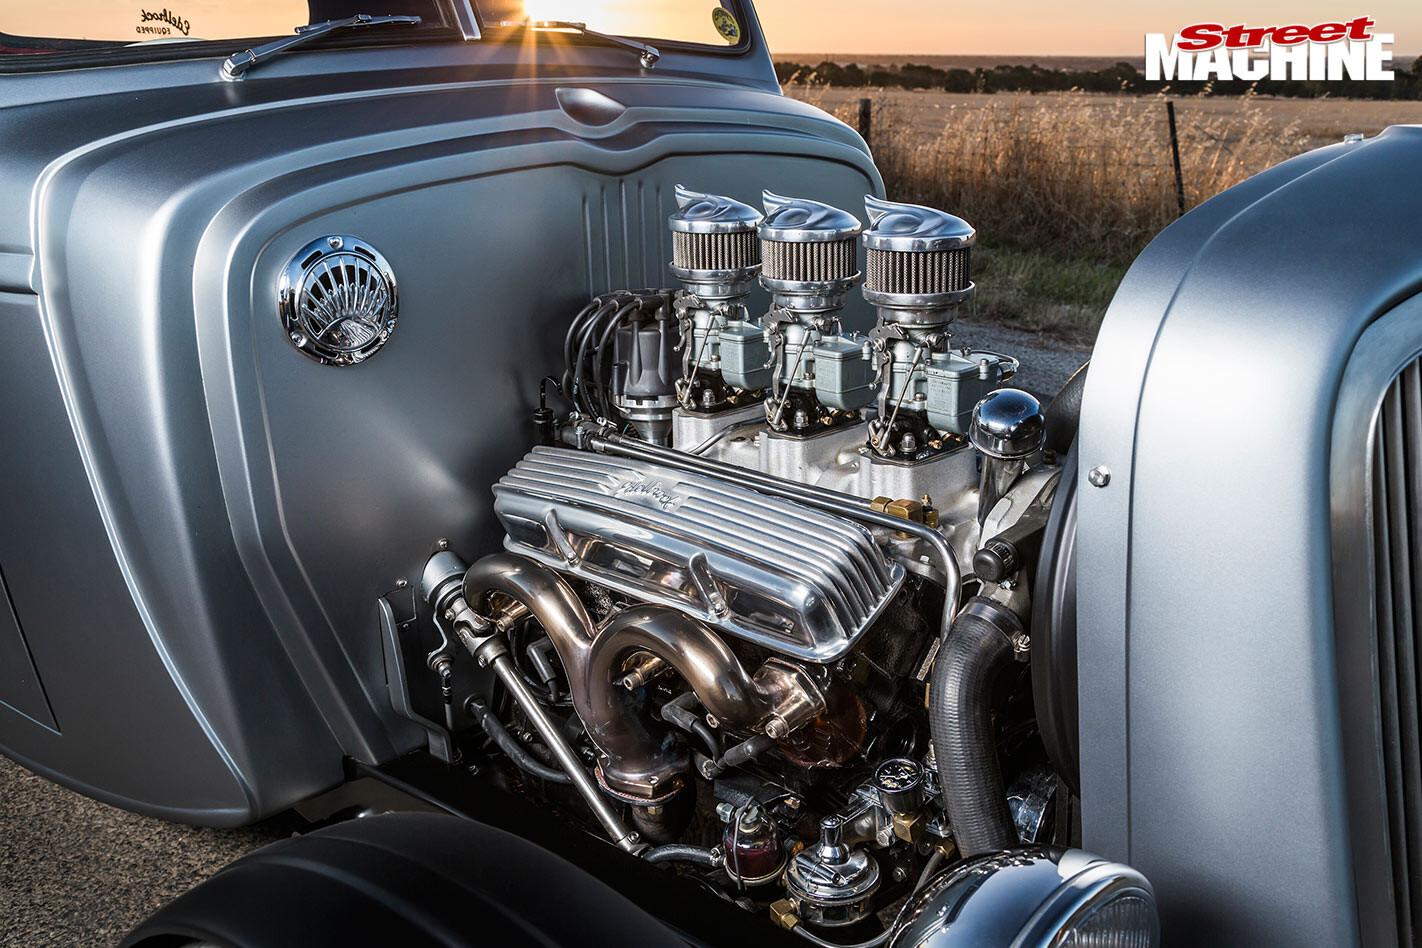 Chev pick-up engine